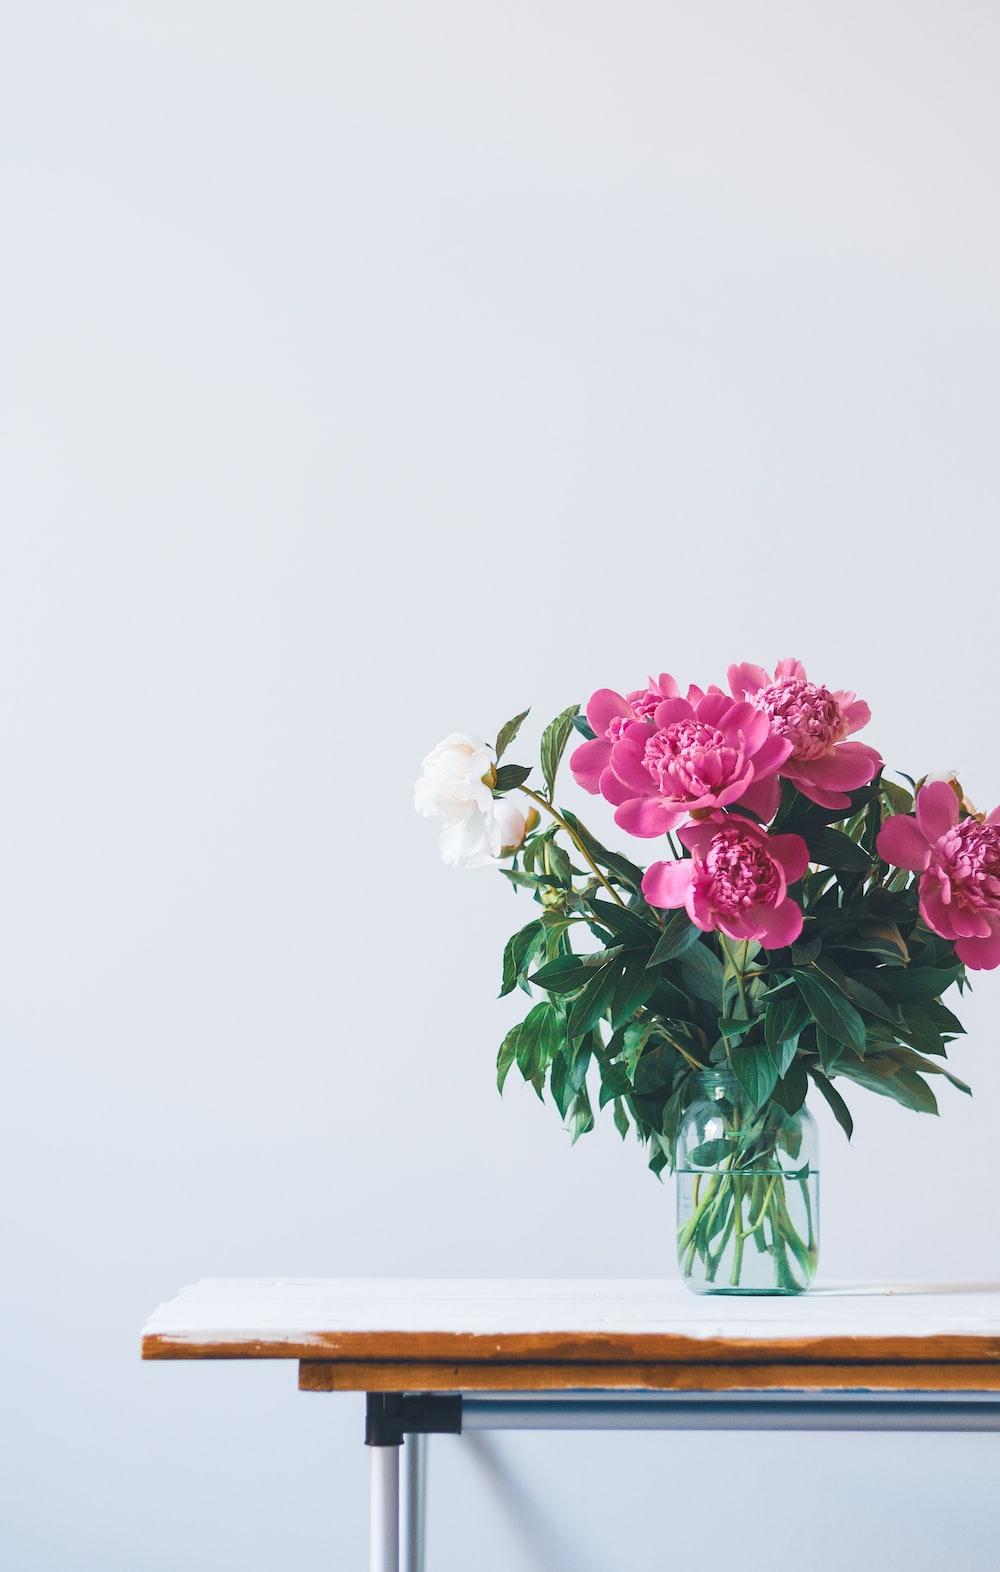 500+ Bouquet Pictures   Download Free Images on Unsplash